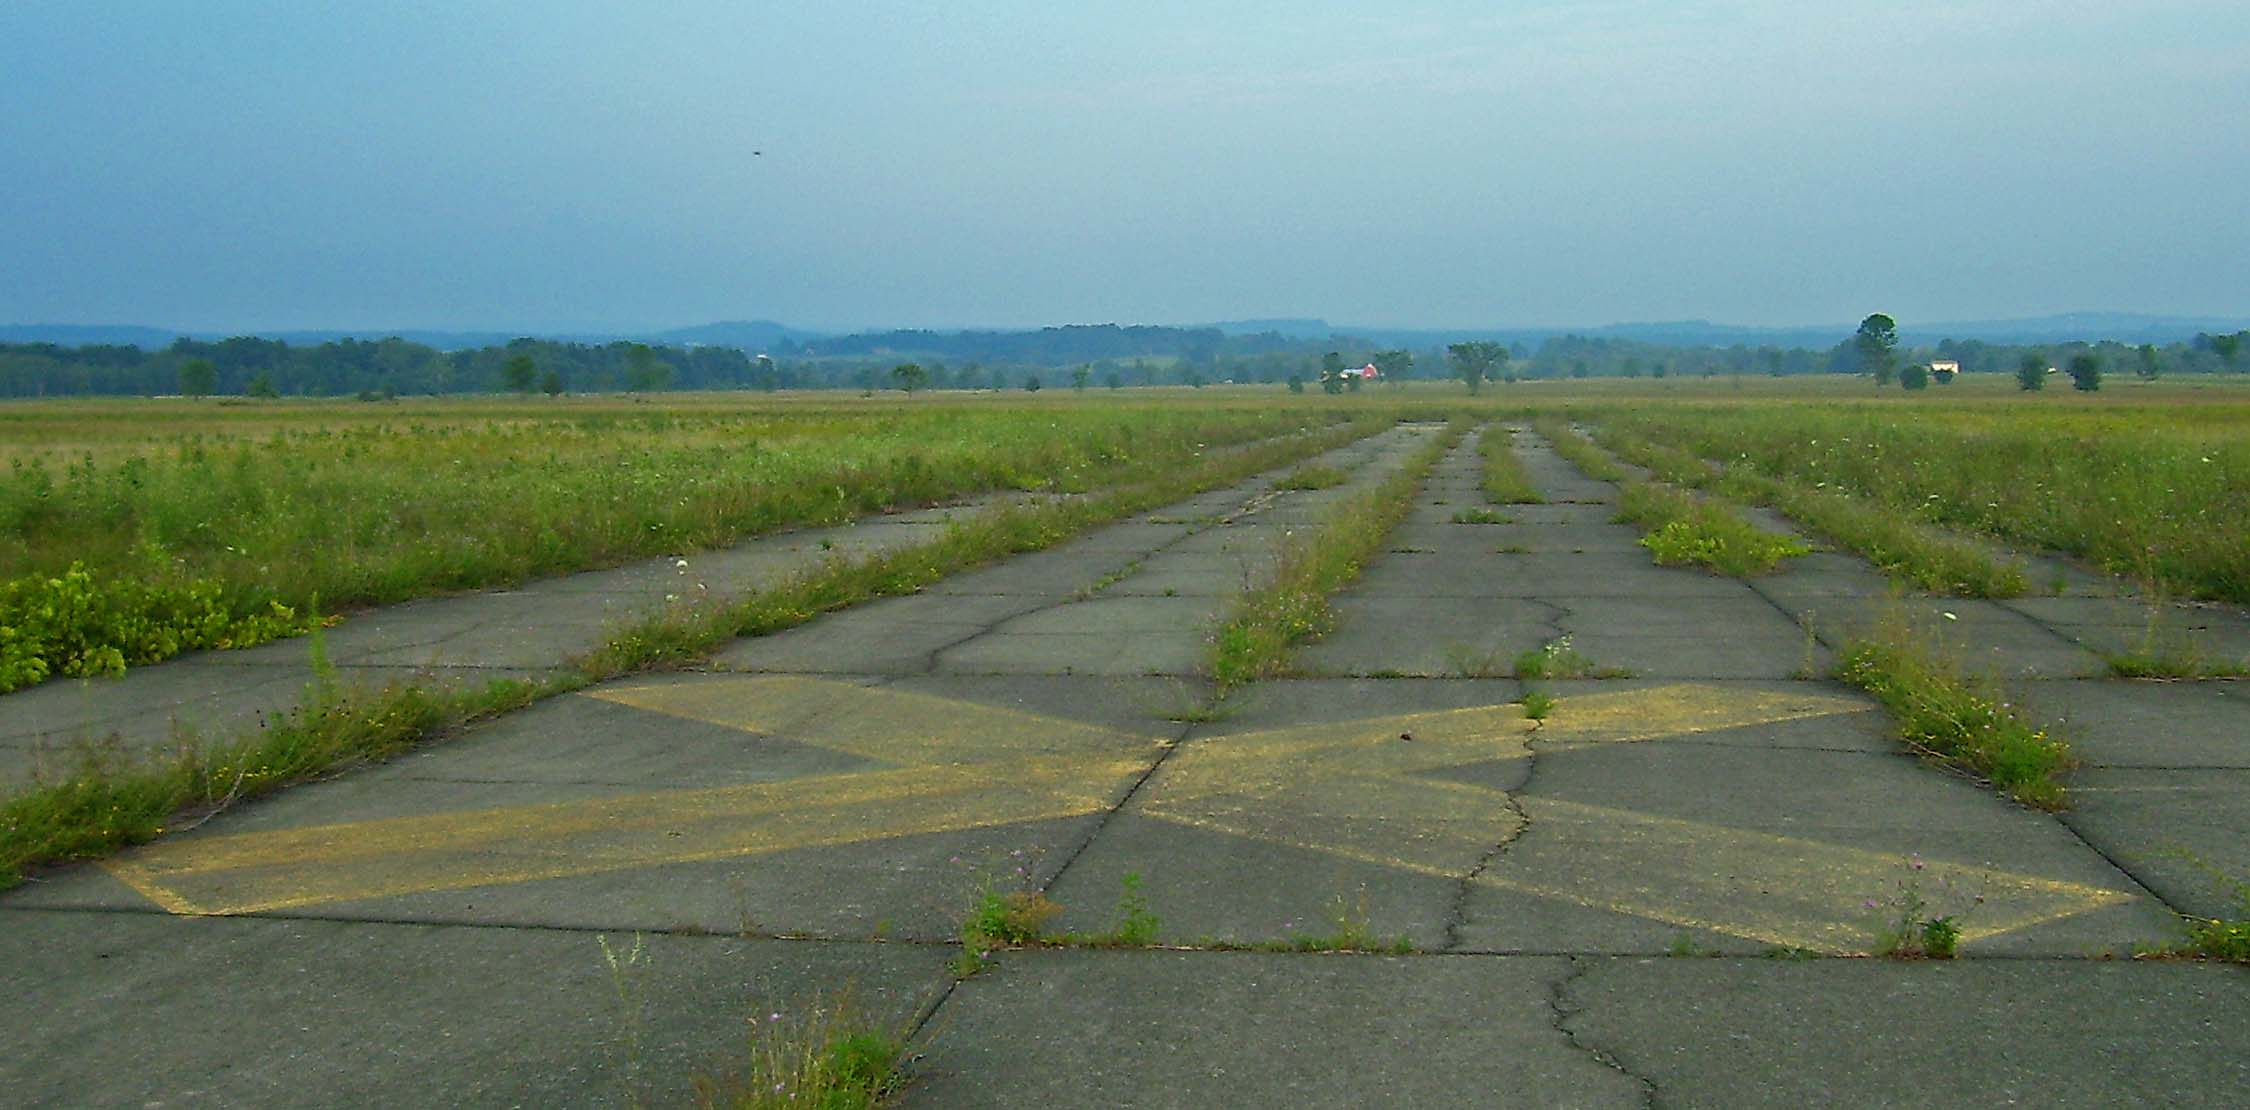 Shawangunk_Grasslands_NWR_runways_2.jpg